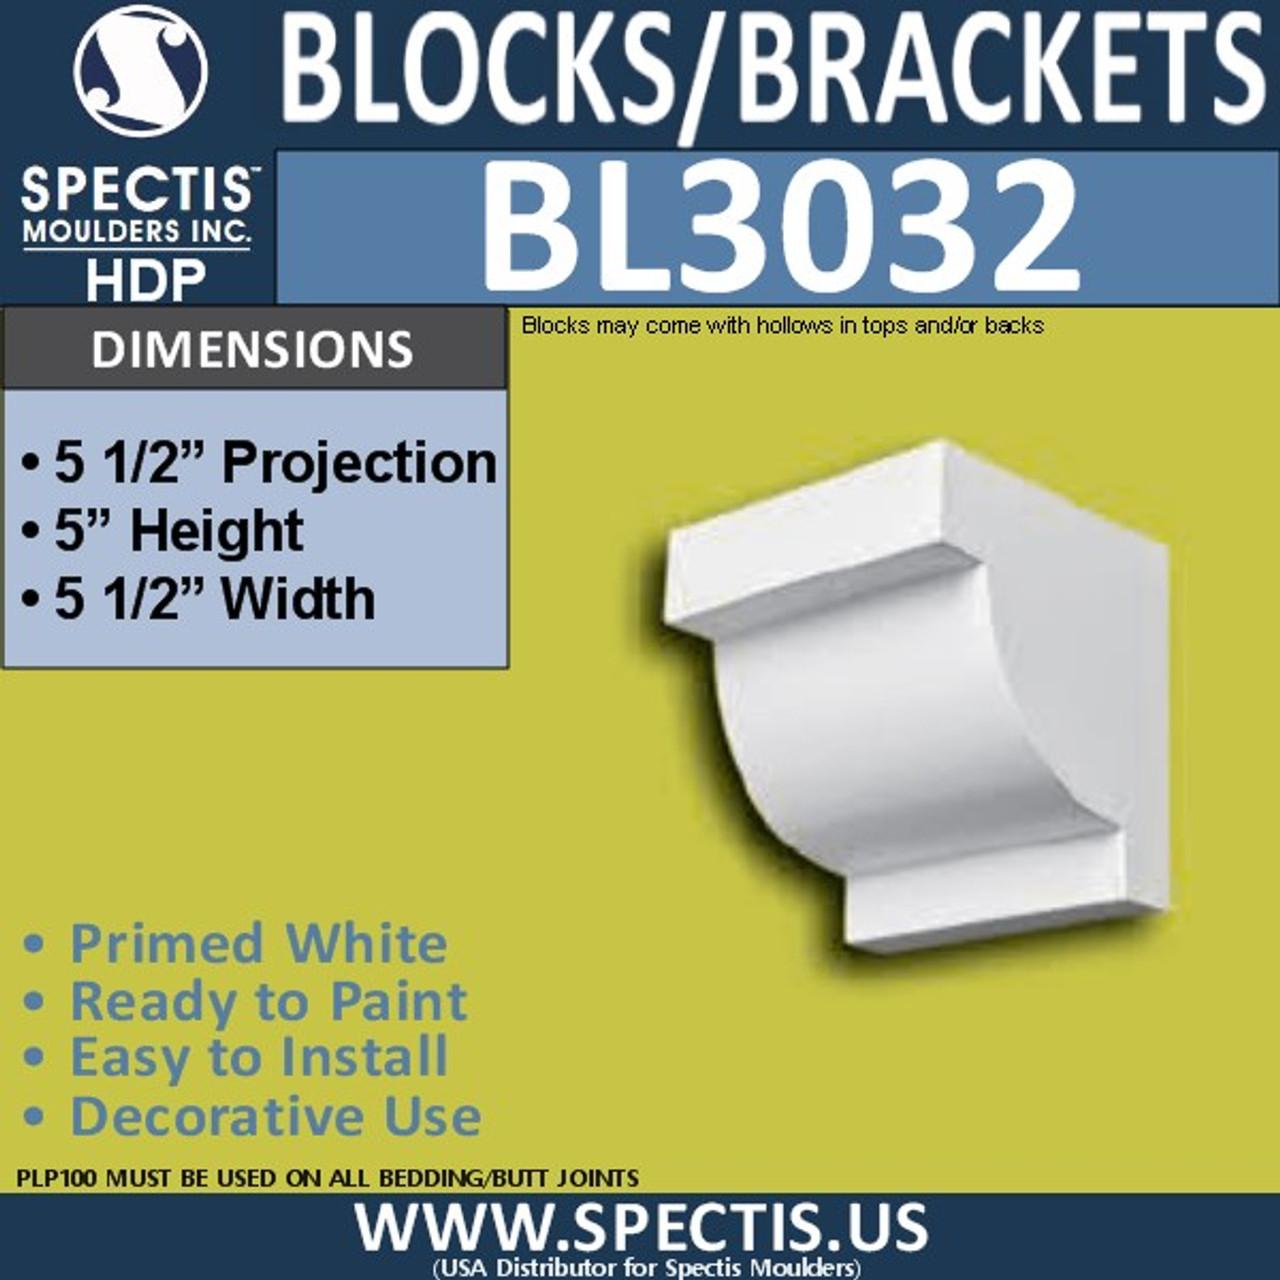 "BL3032 Eave Block or Bracket 5.5""W x 5""H x 5.5"" P"